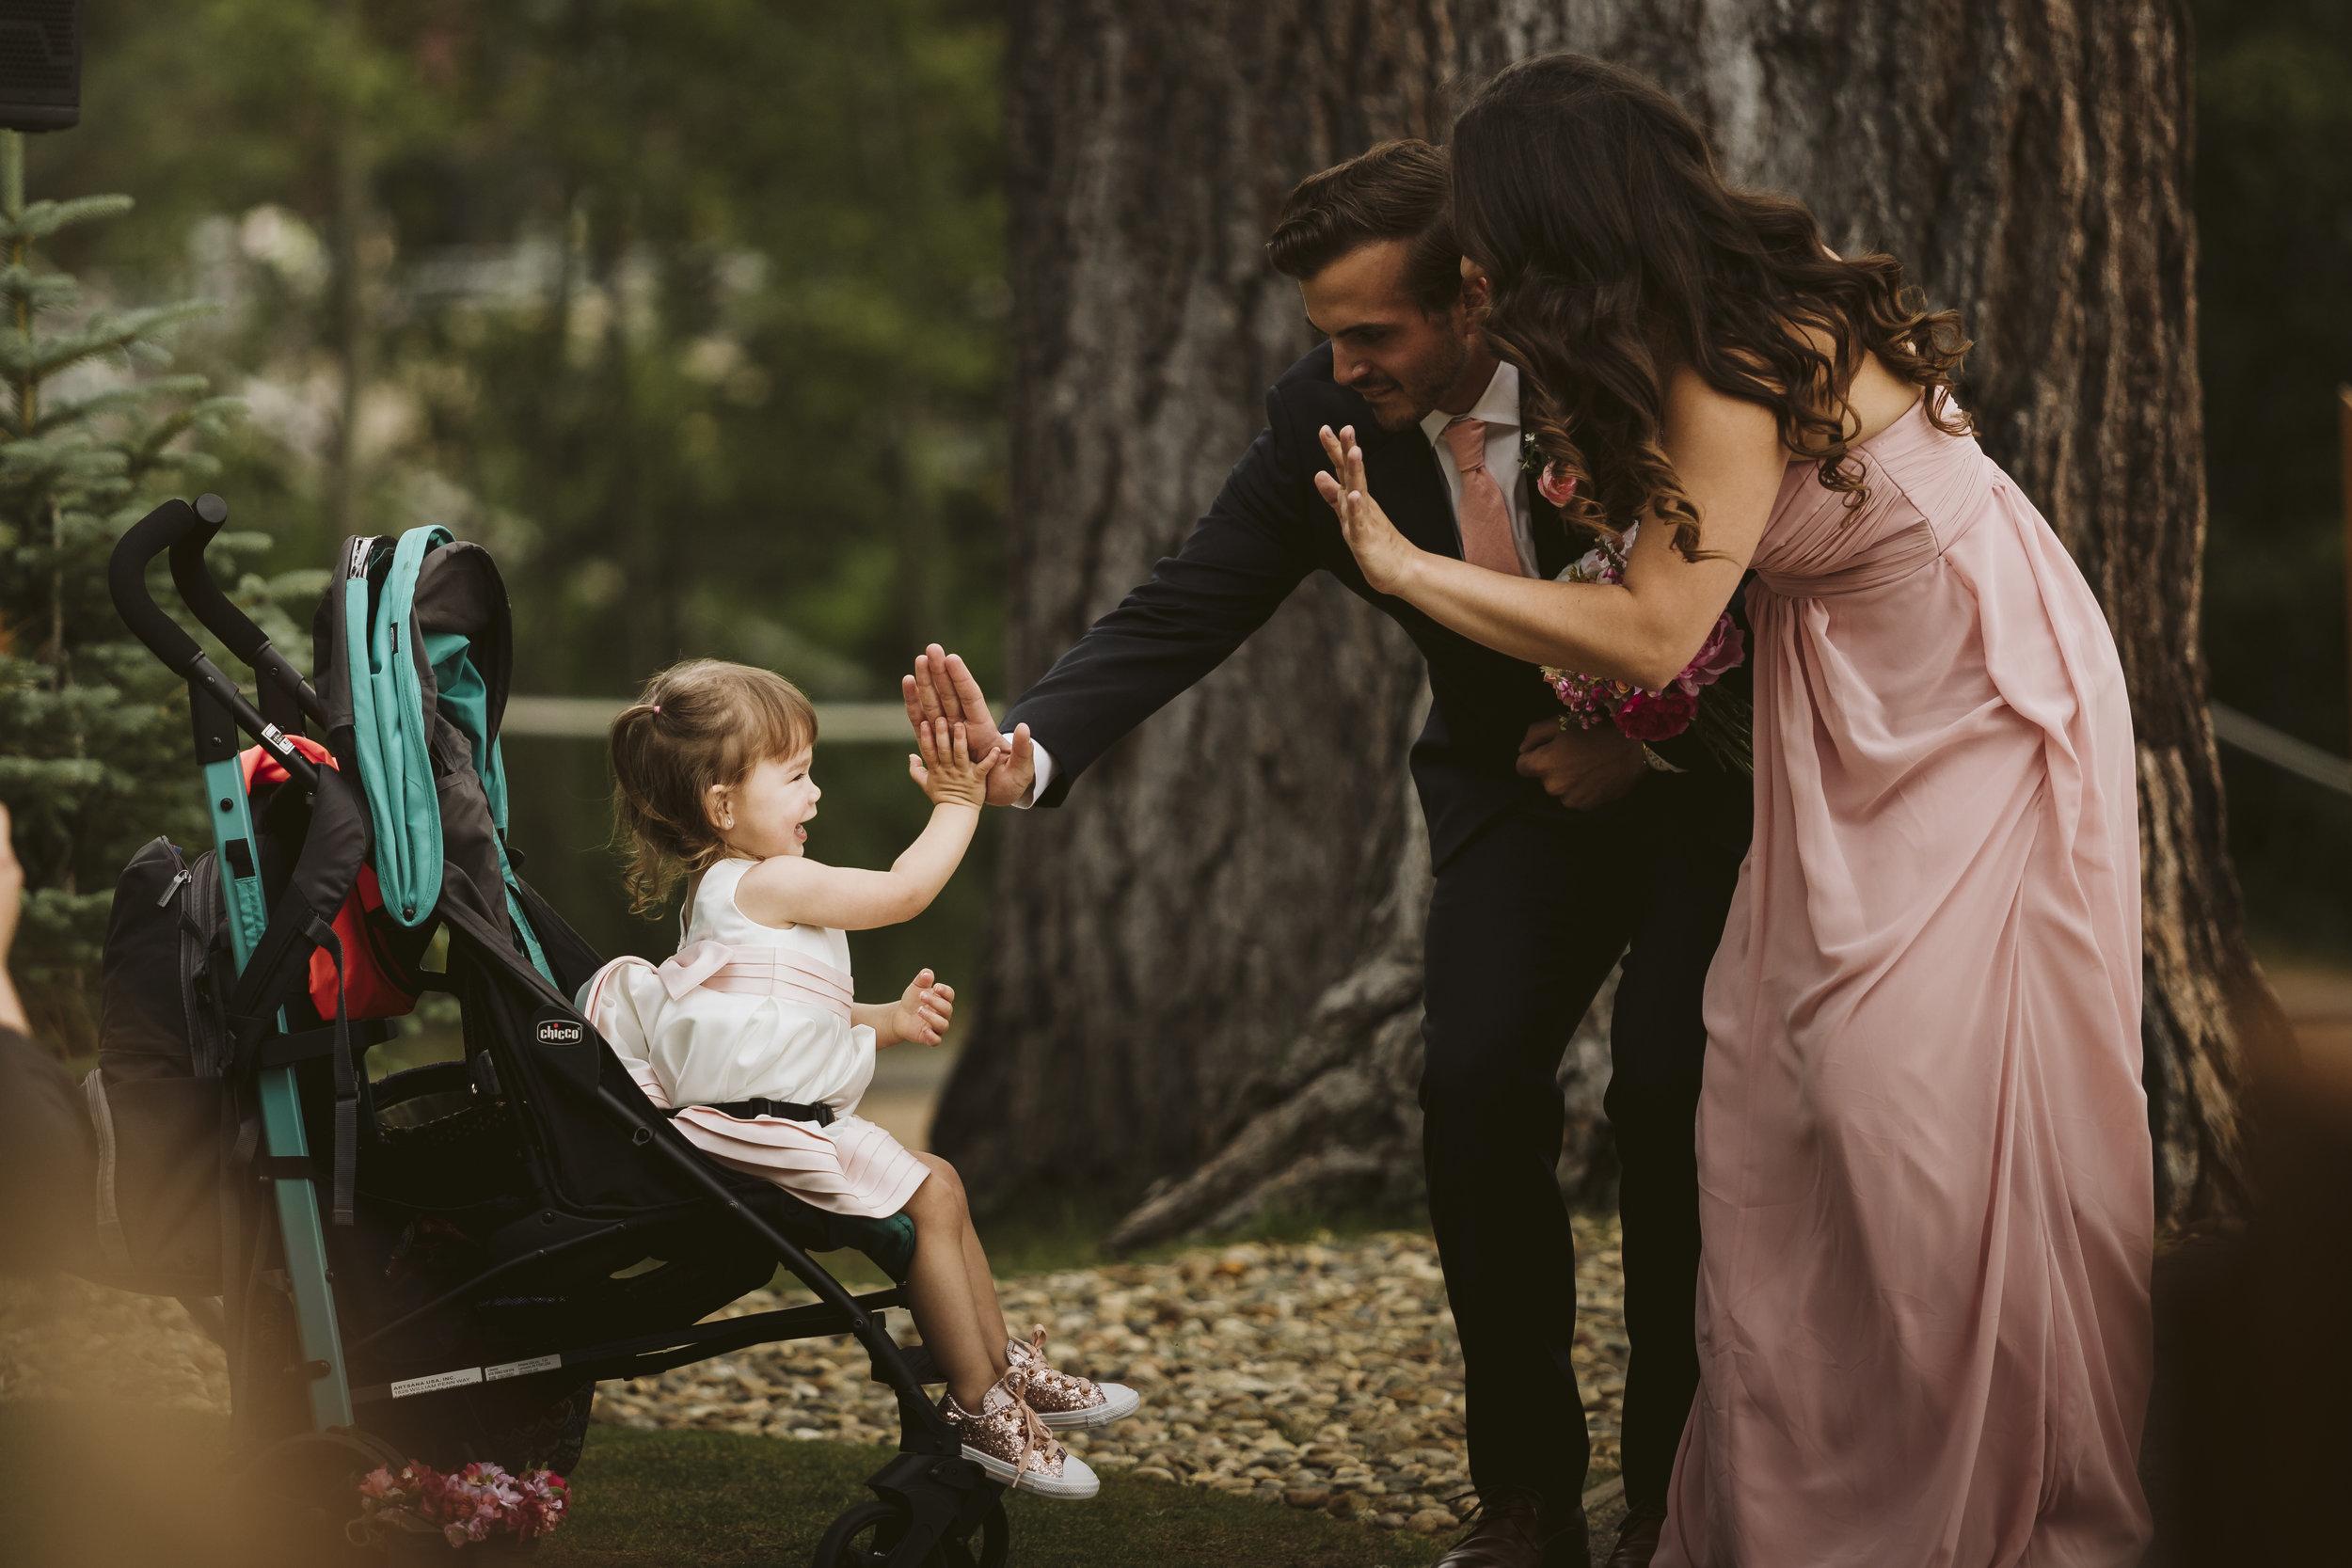 _MG_9583vild-vild photography-photography-wedding-wedding photography-tahoe-lake tahoe-lake tahoe wedding photographer-nevada wedding photographer-mountain wedding.jpg